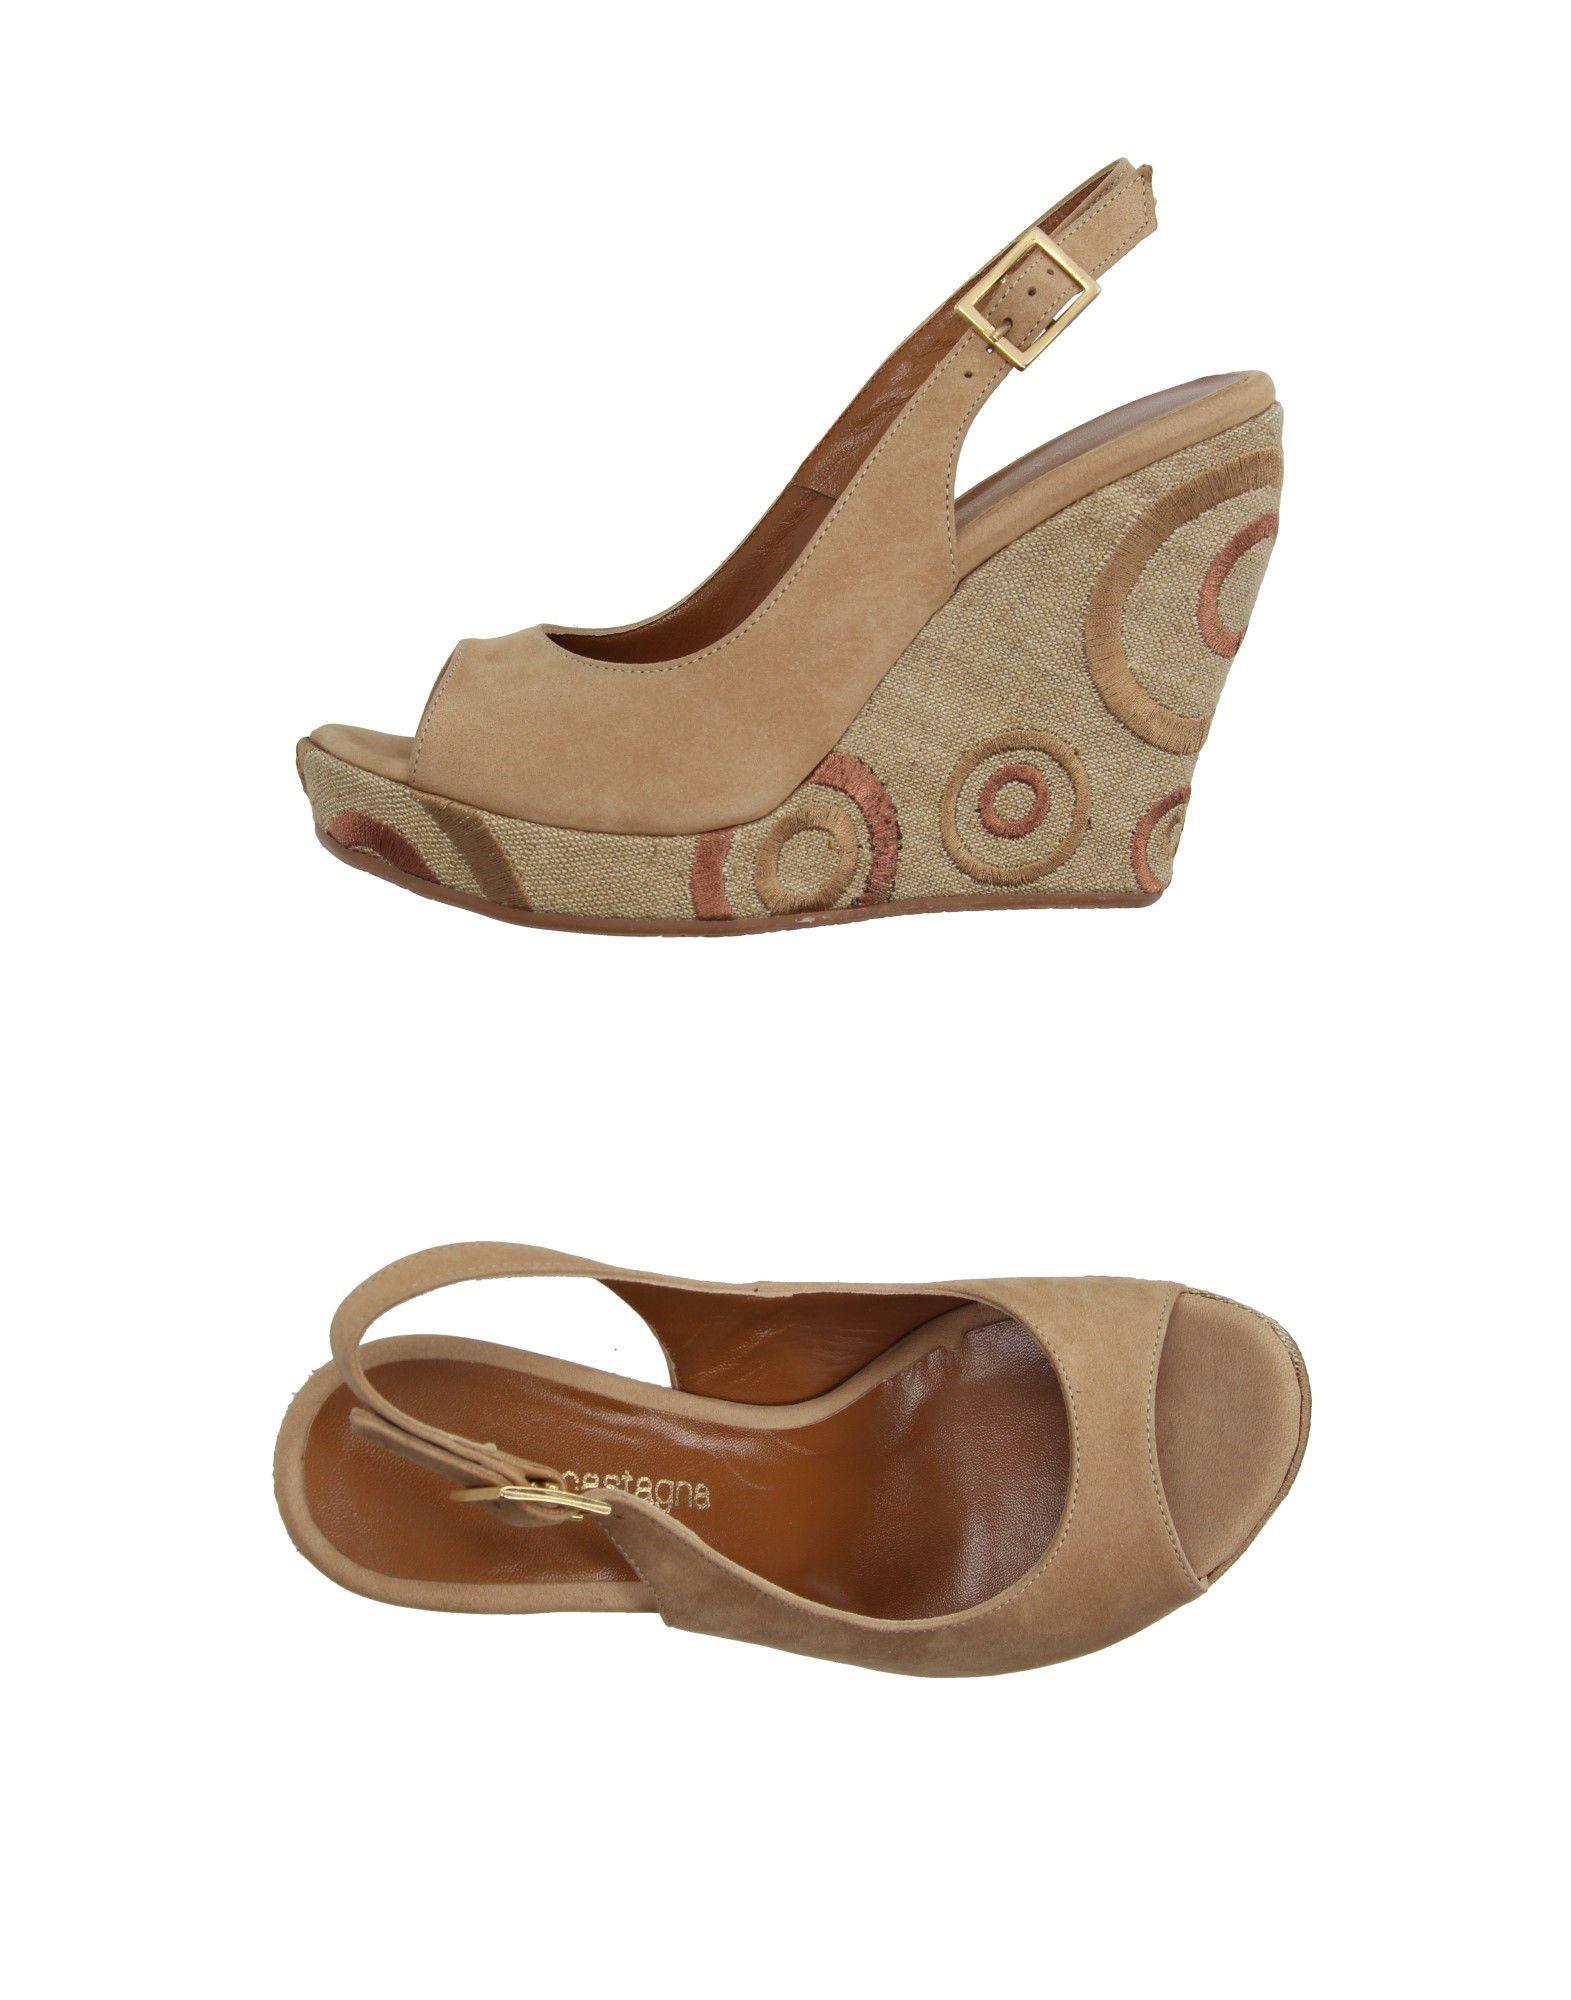 Aldo Castagna Sandalen Qualität Damen  11022028PM Gute Qualität Sandalen beliebte Schuhe 31347d